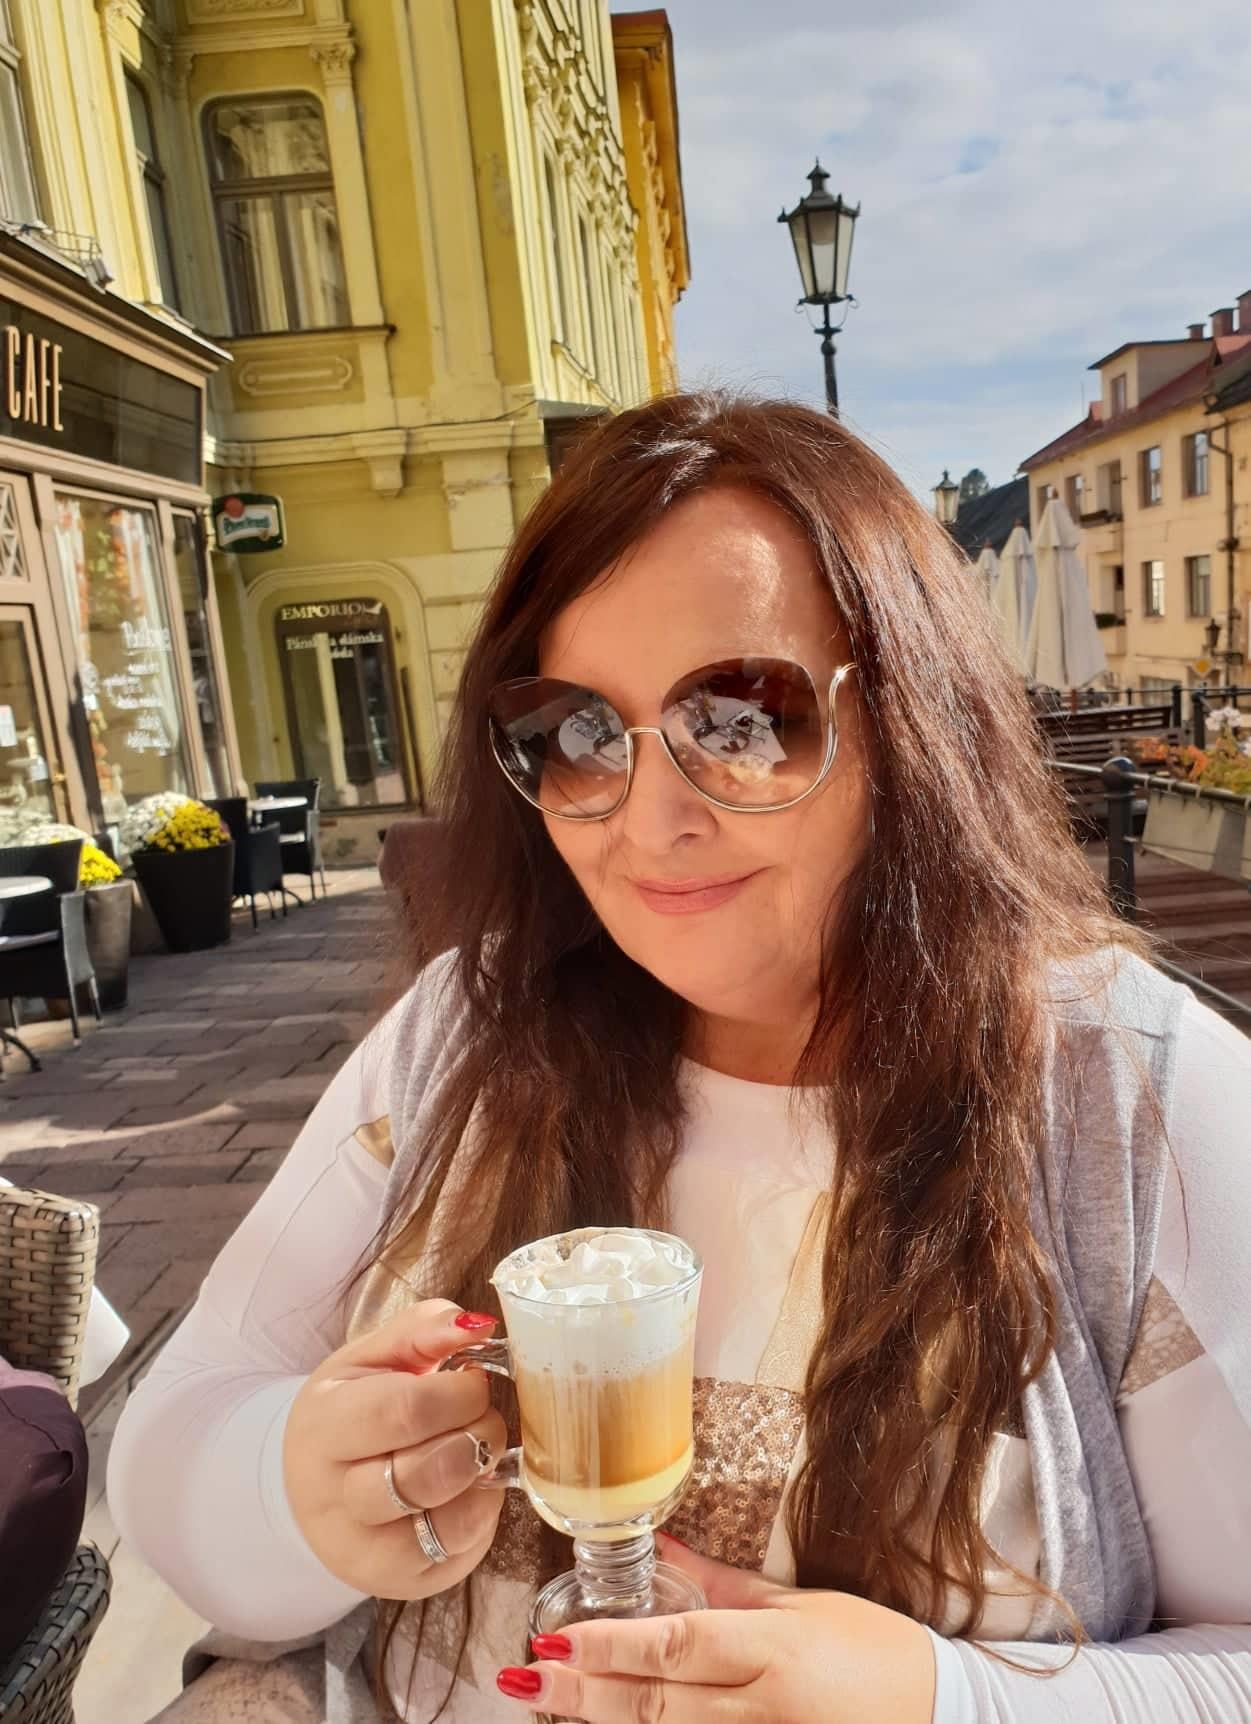 Renata Názlerová